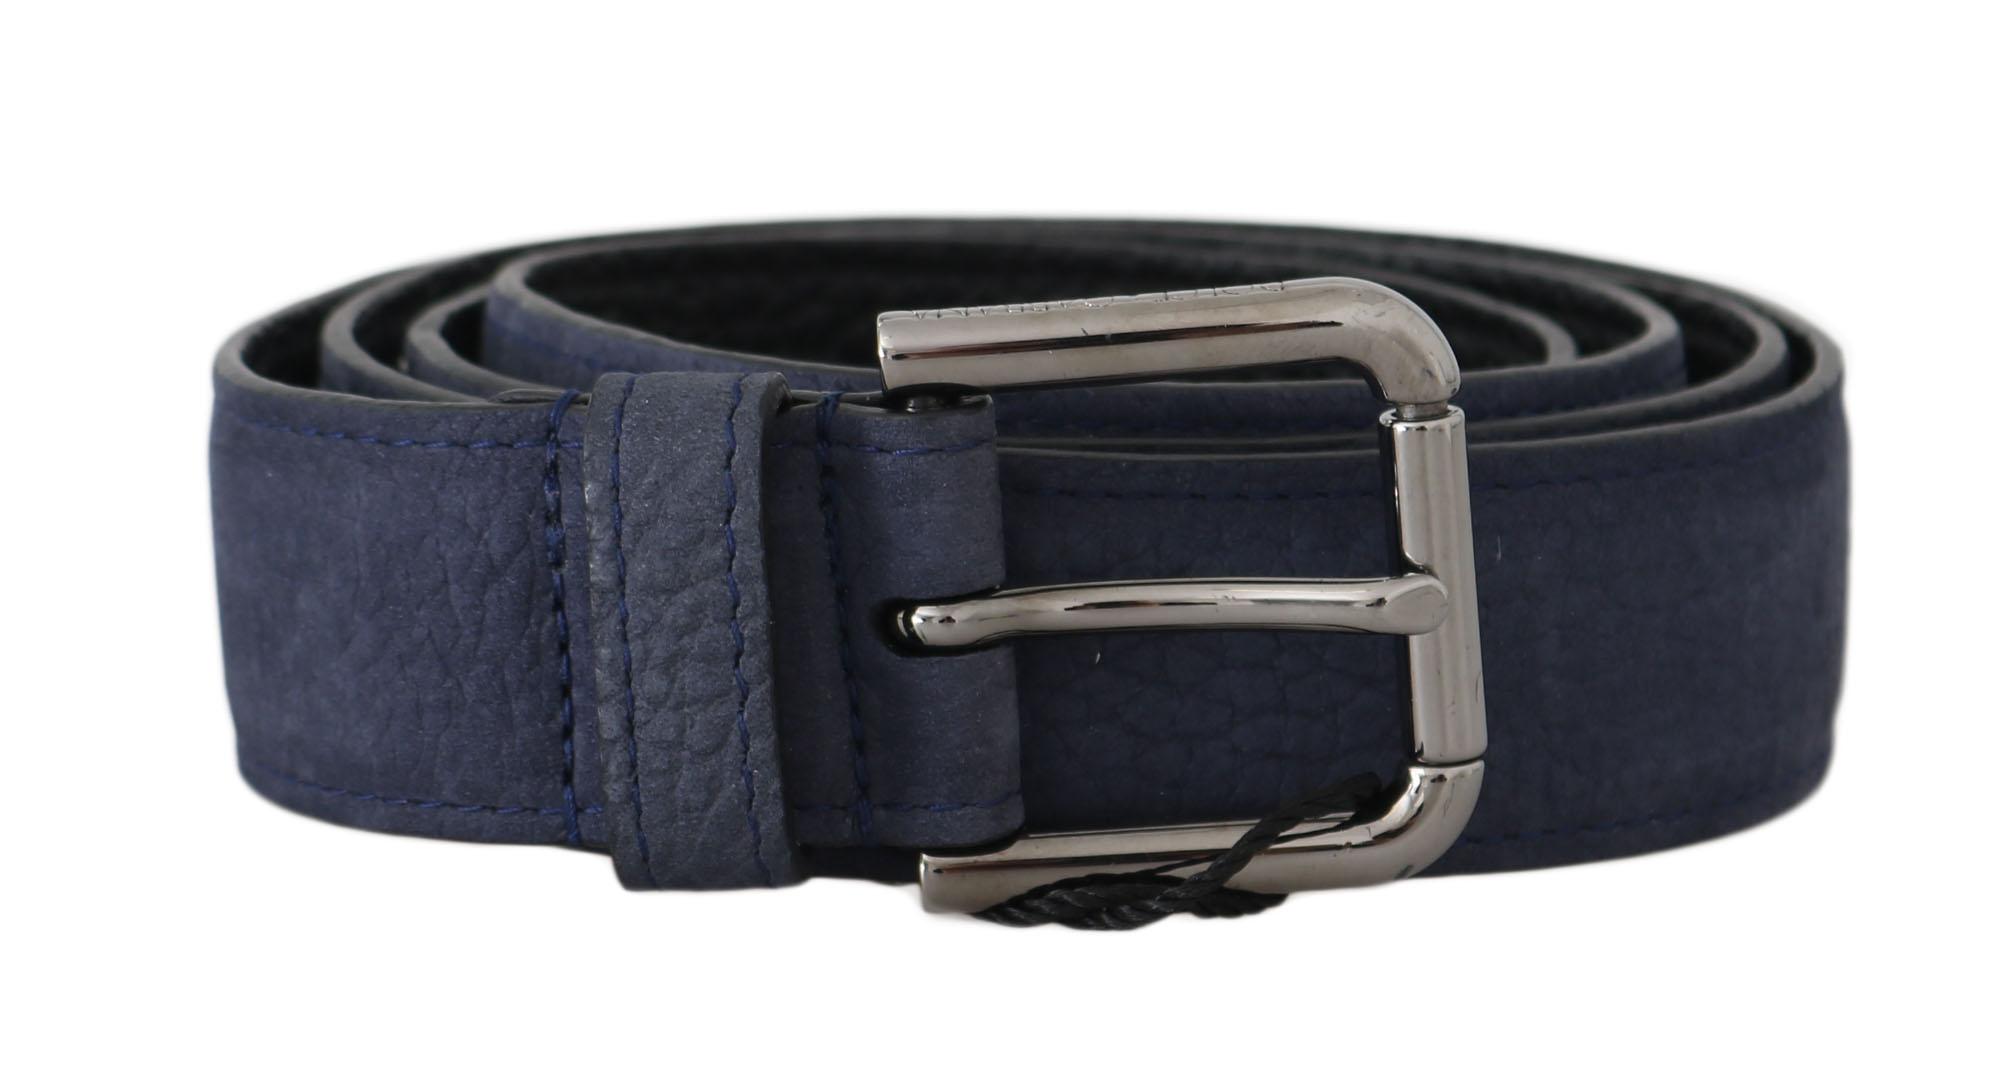 Dolce & Gabbana Men's Belt Blue BEL50300 - 90 cm / 36 Inches